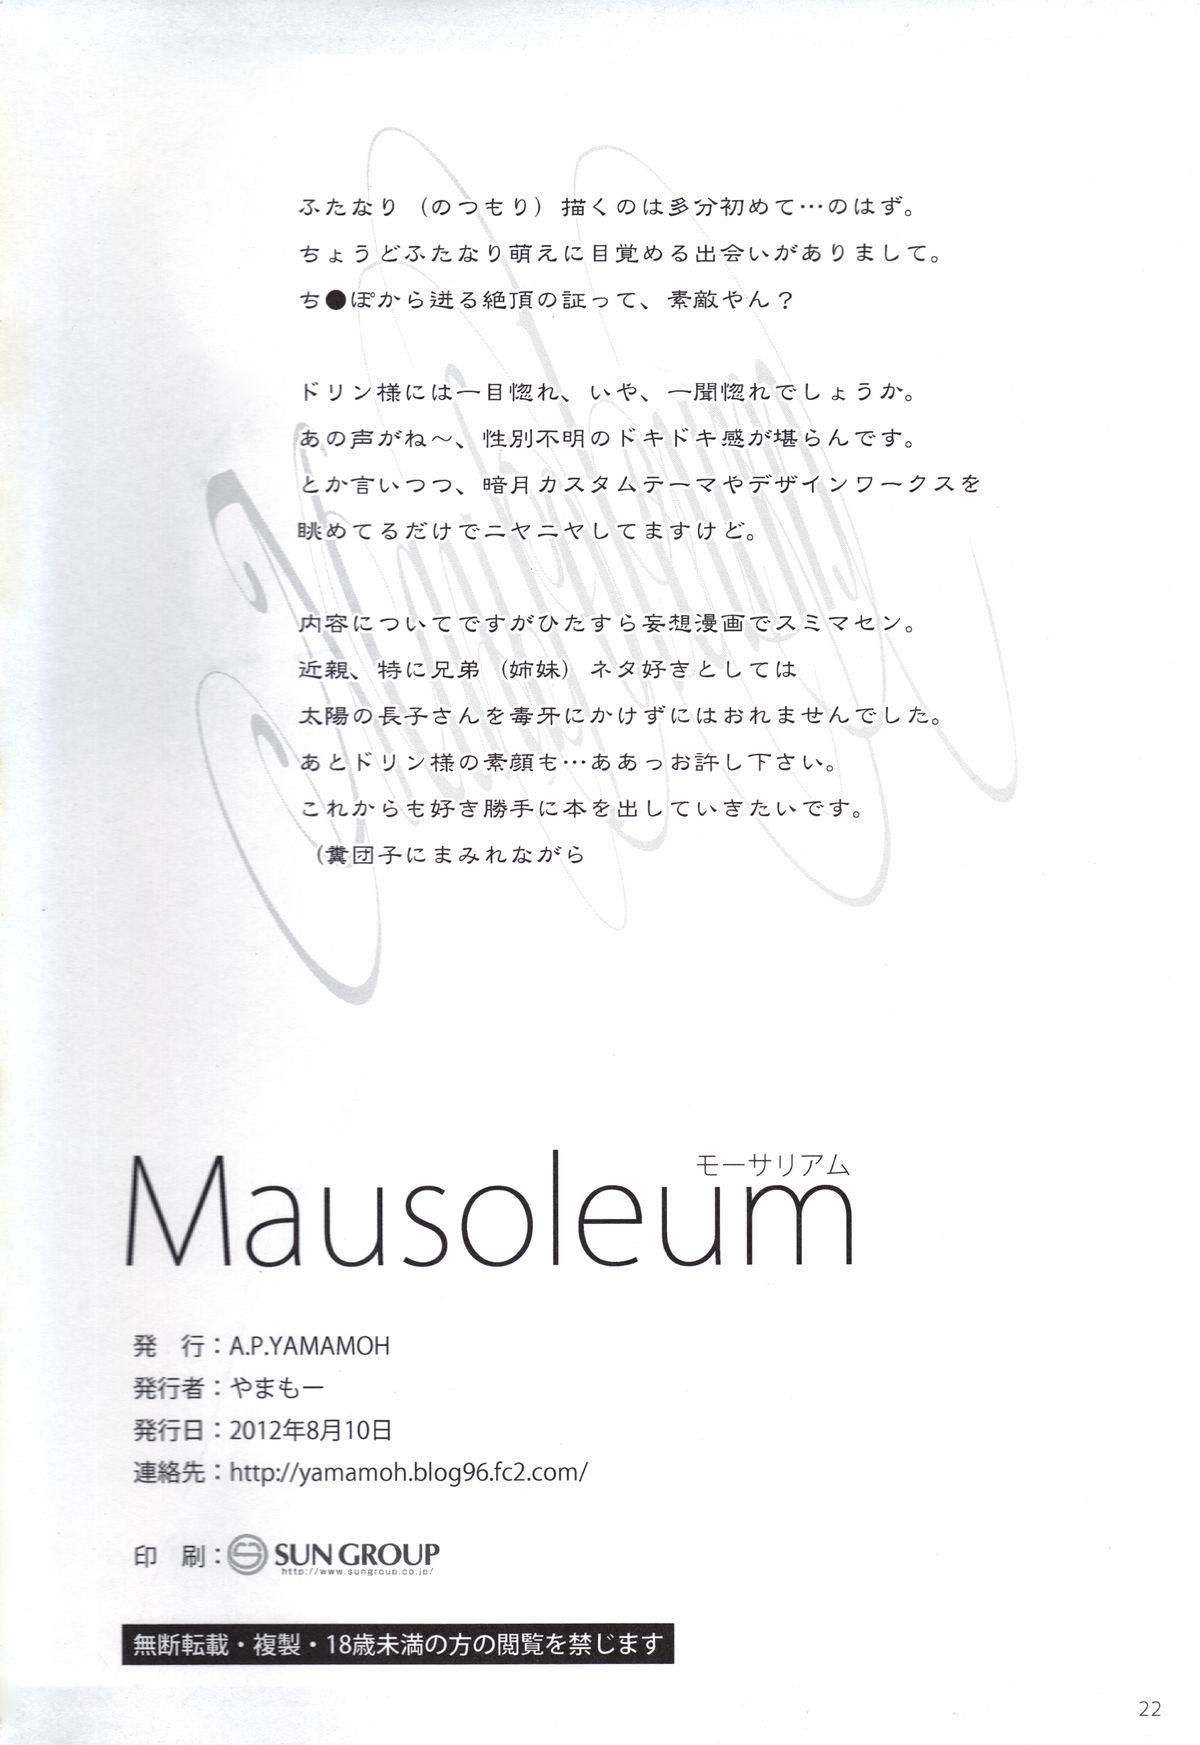 Mausoleum 20